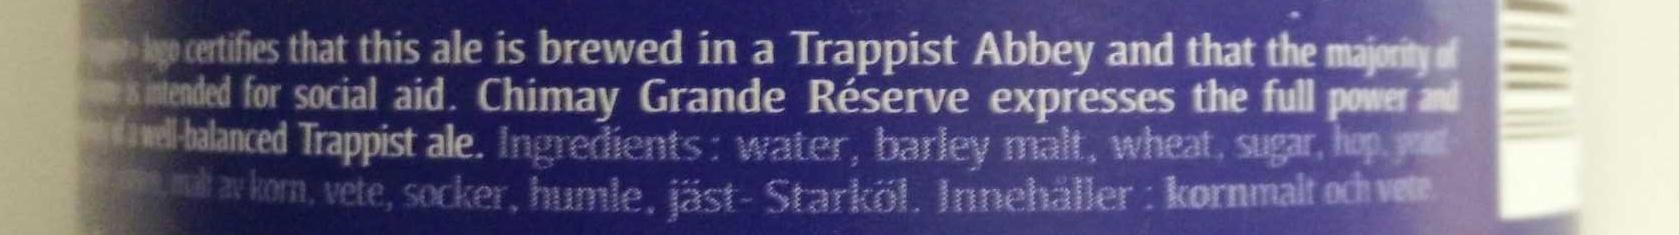 Chimay Bleu Grande Réserve - Ingredients